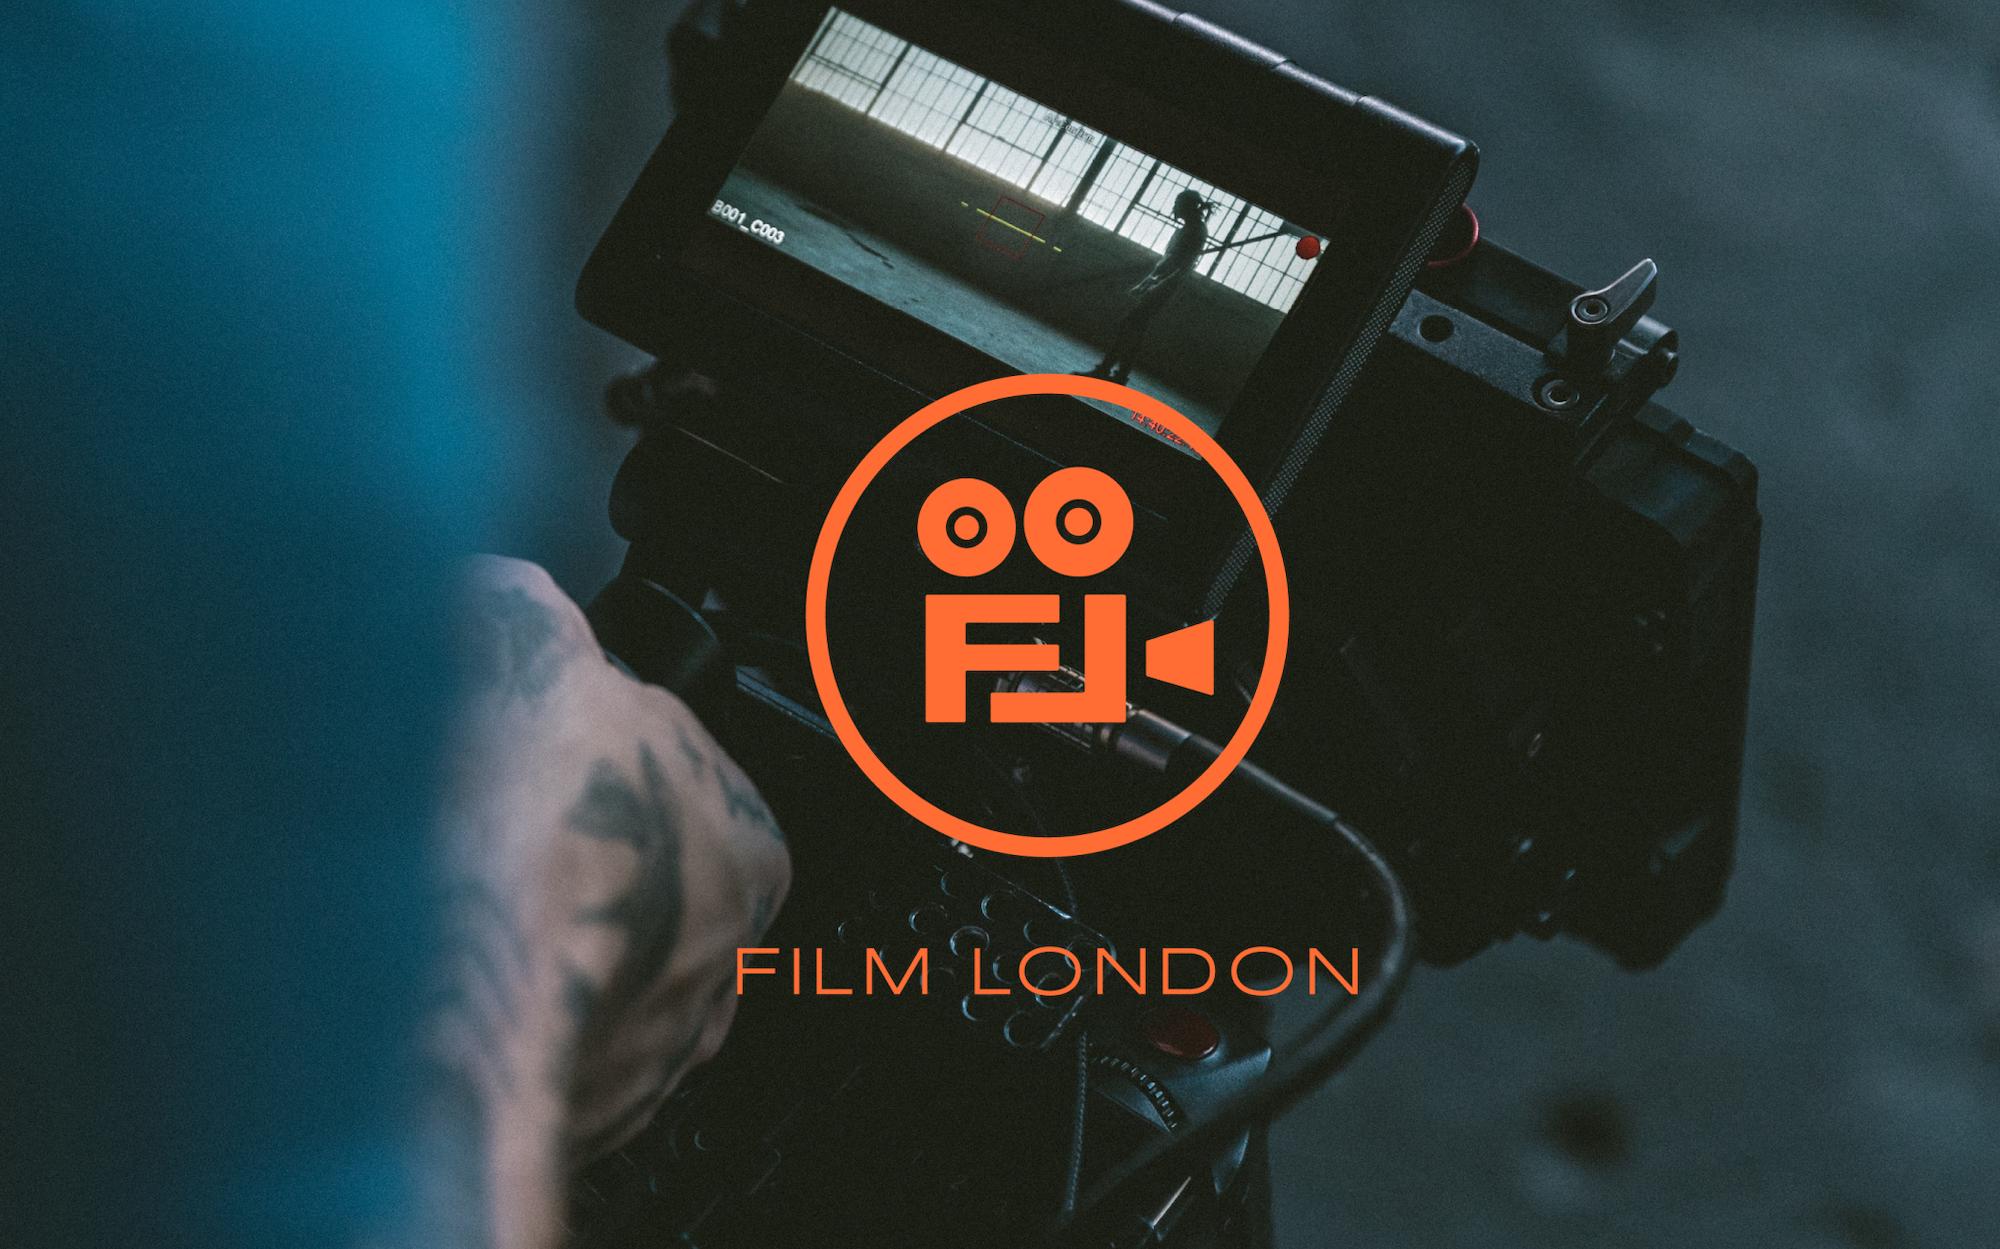 orange Film London logo on an image of a camera